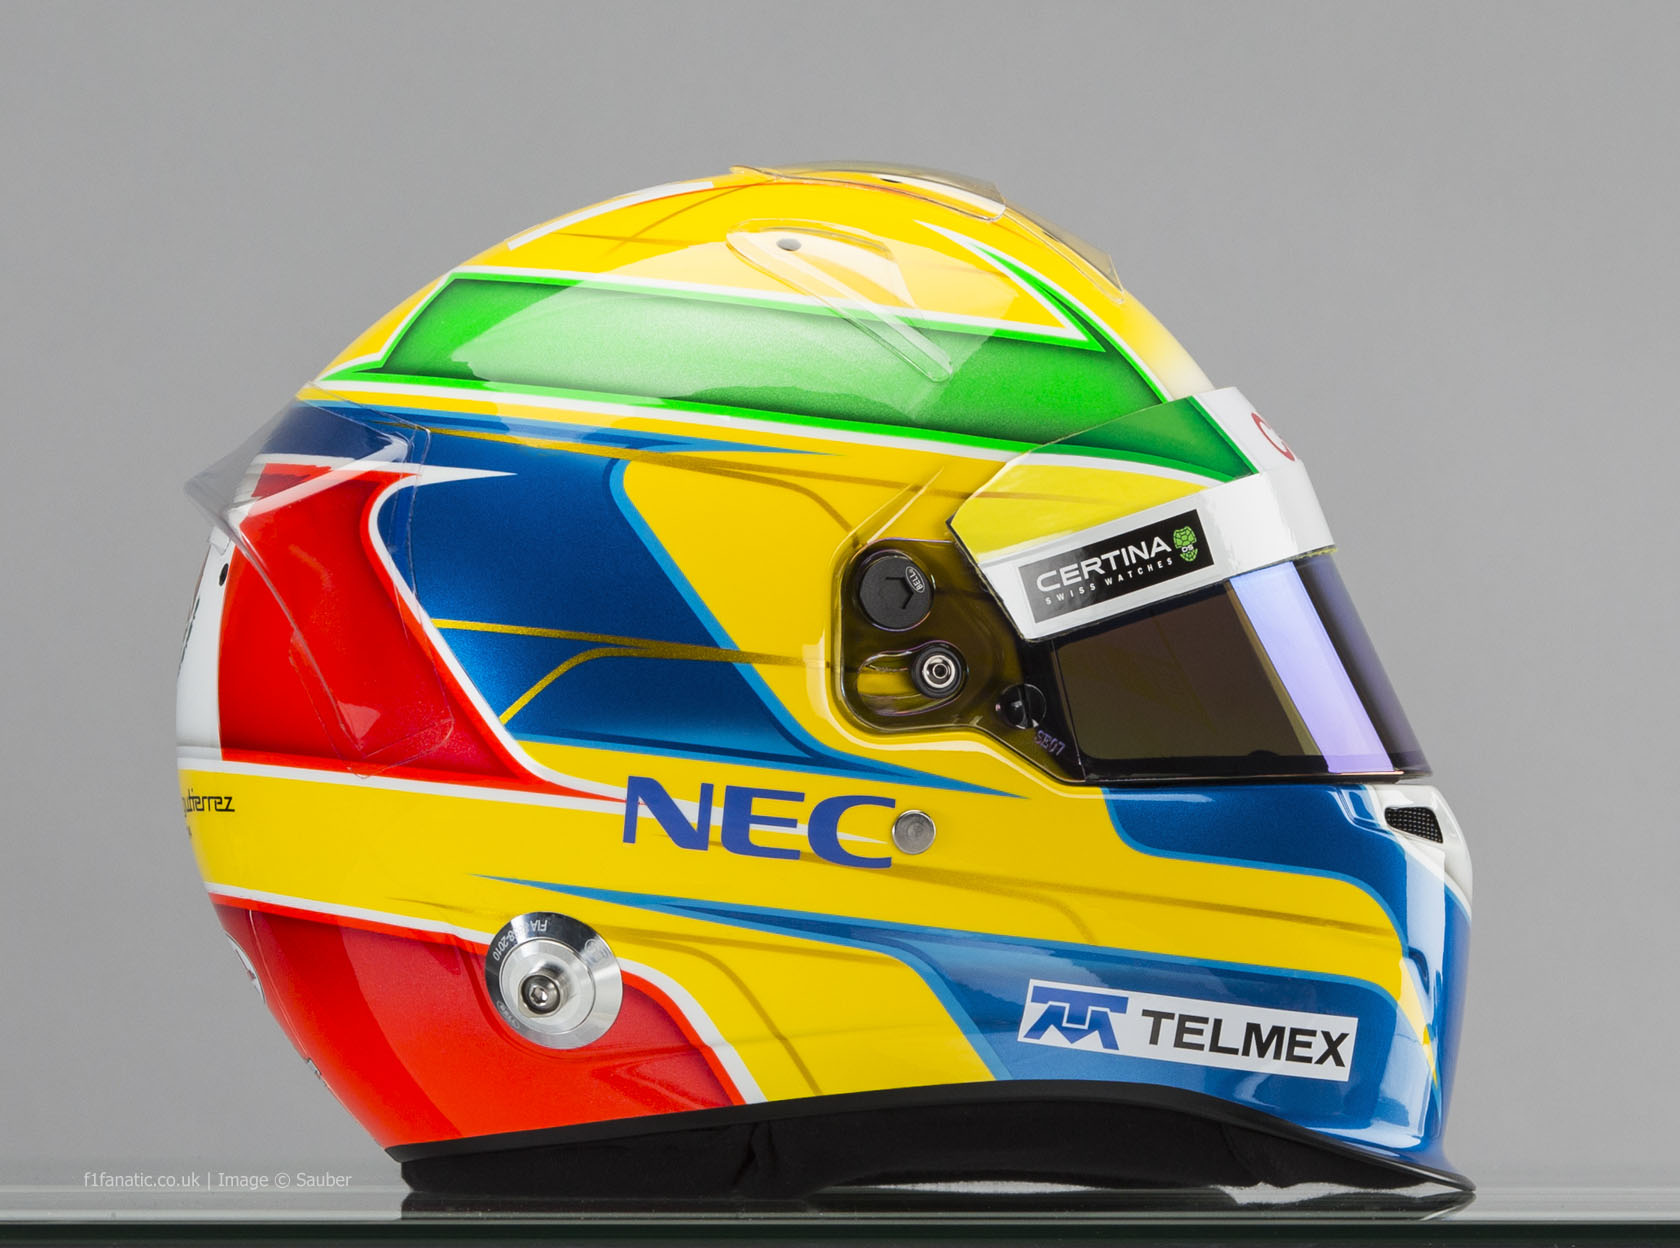 Esteban Gutierrez helmet, right, Sauber, 2014